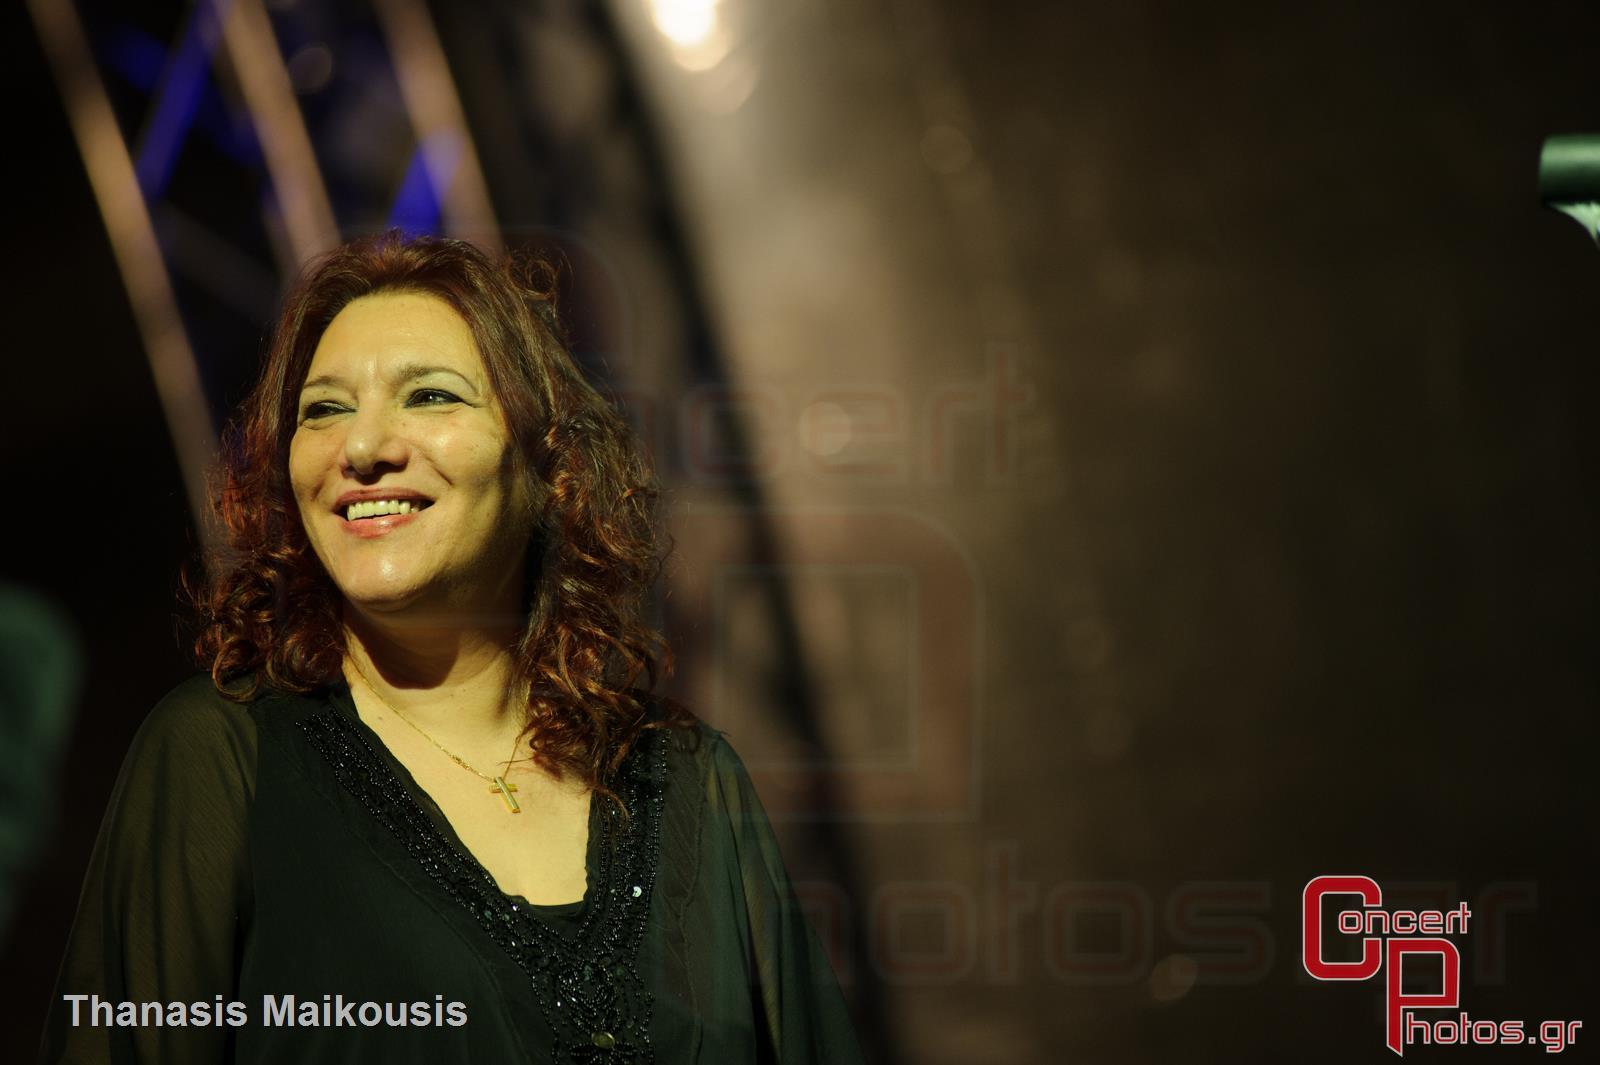 Active Member - Τραγούδα μας να φύγει το σκοτάδι- photographer: Thanasis Maikousis - concertphotos_-5644